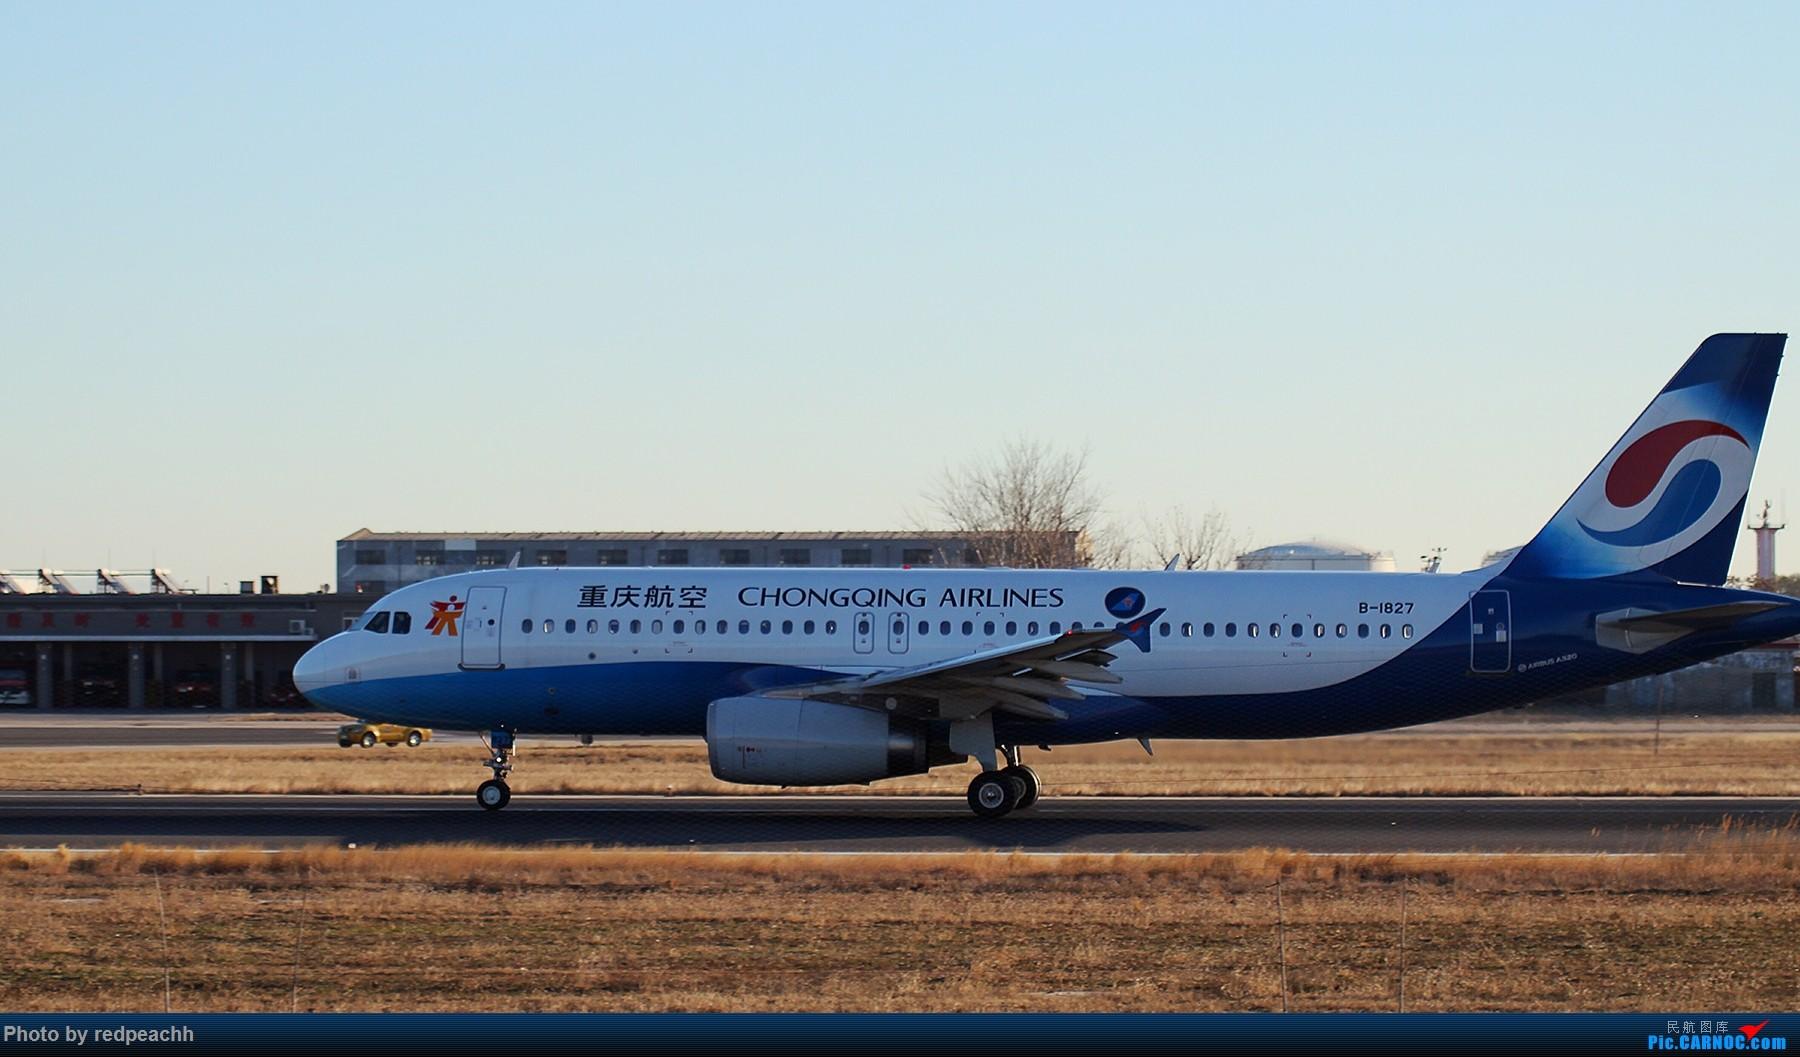 Re:[原创](持续更新)河北人为拍机而首都机场2日游(杨二营、八卦台)虽均为常规货但值得纪念(36L) AIRBUS A320-200 B-1827 中国北京首都国际机场